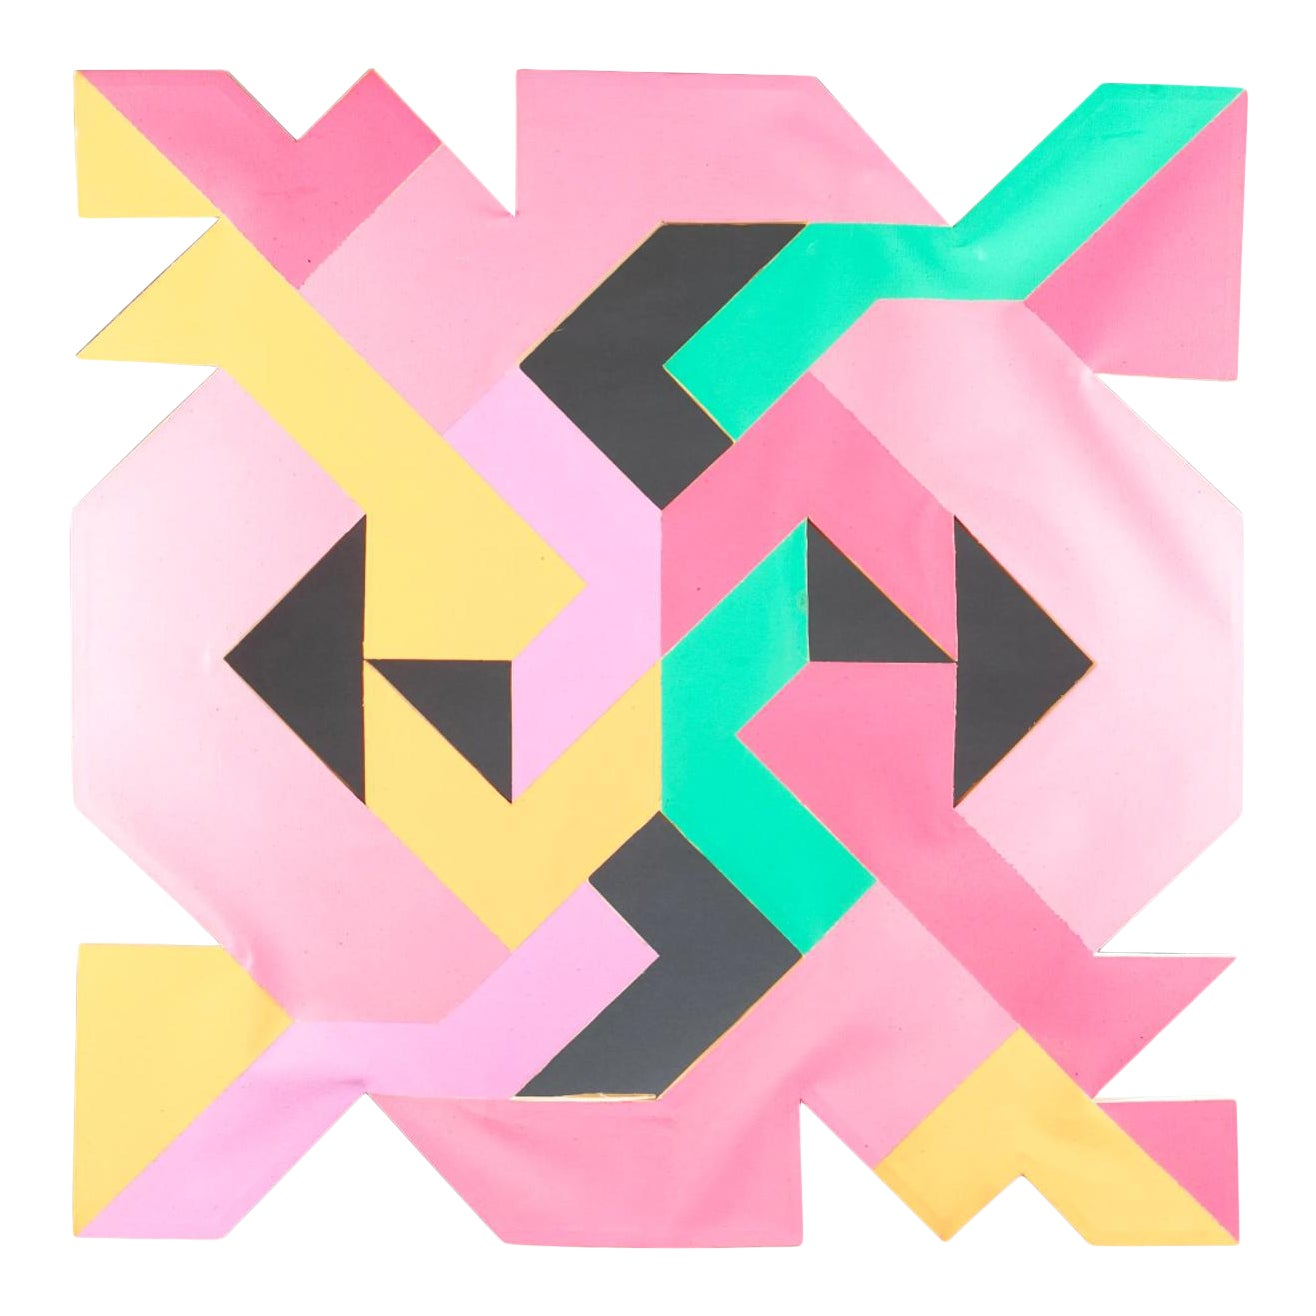 geometric hard-edged mcm painting